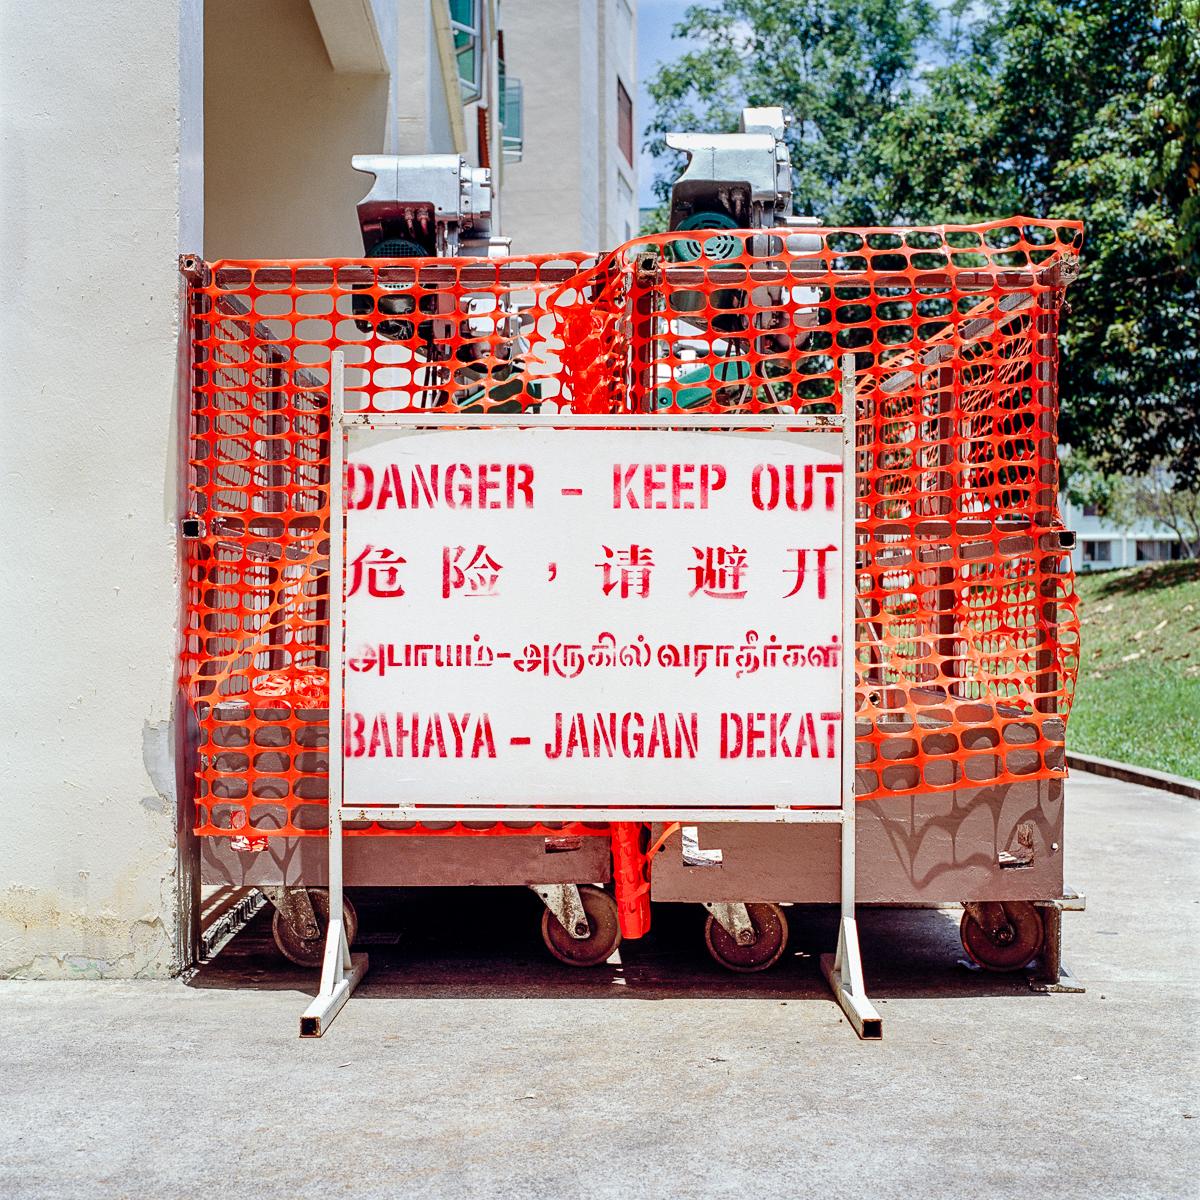 singapore Seeking Danger danger signs construction Hasselblad danger keep out